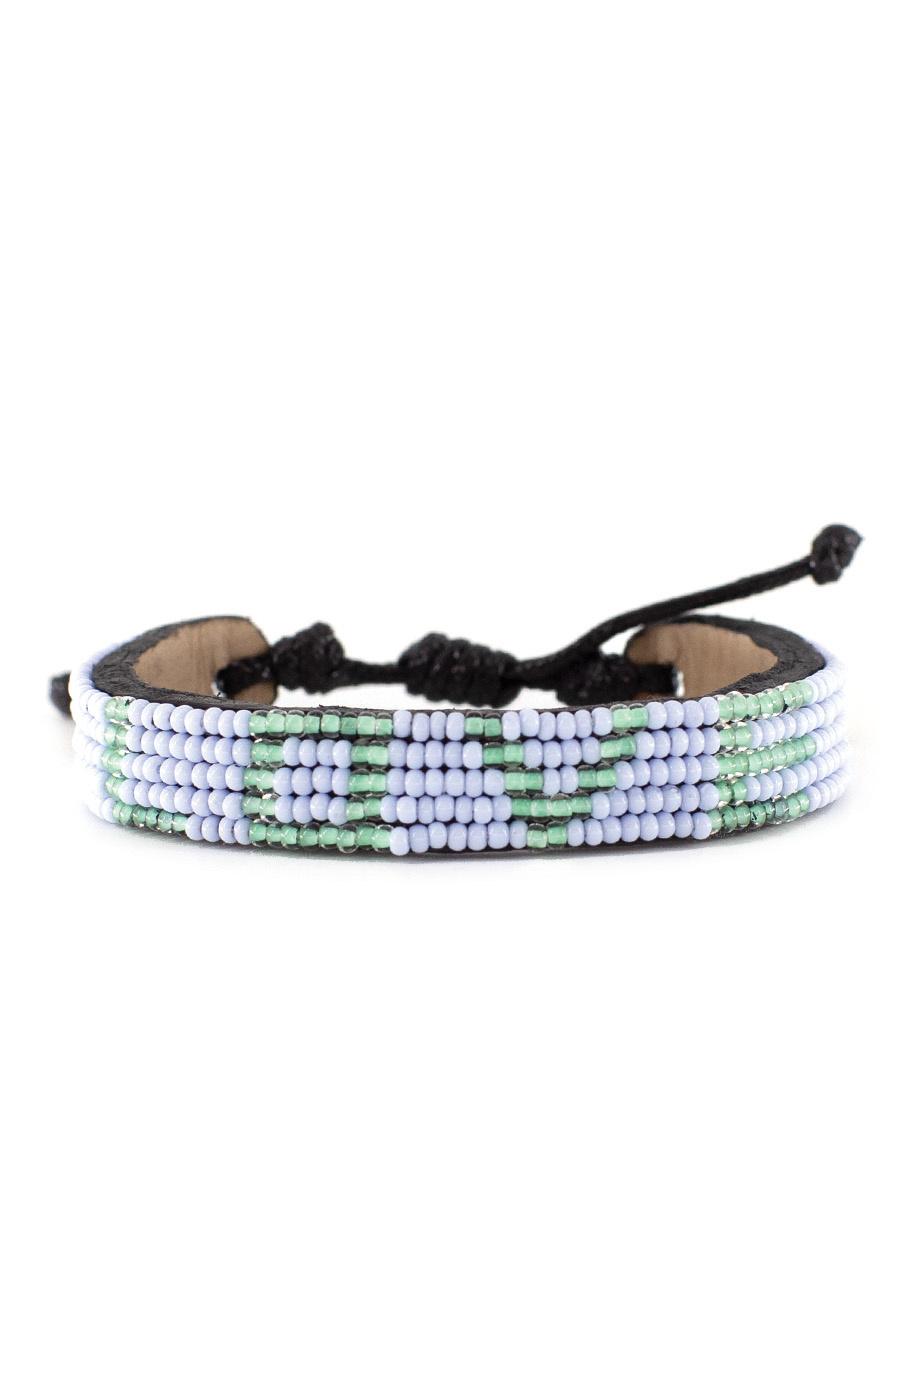 5 row LOVE Bracelet PaleBlue/Turquoise-1